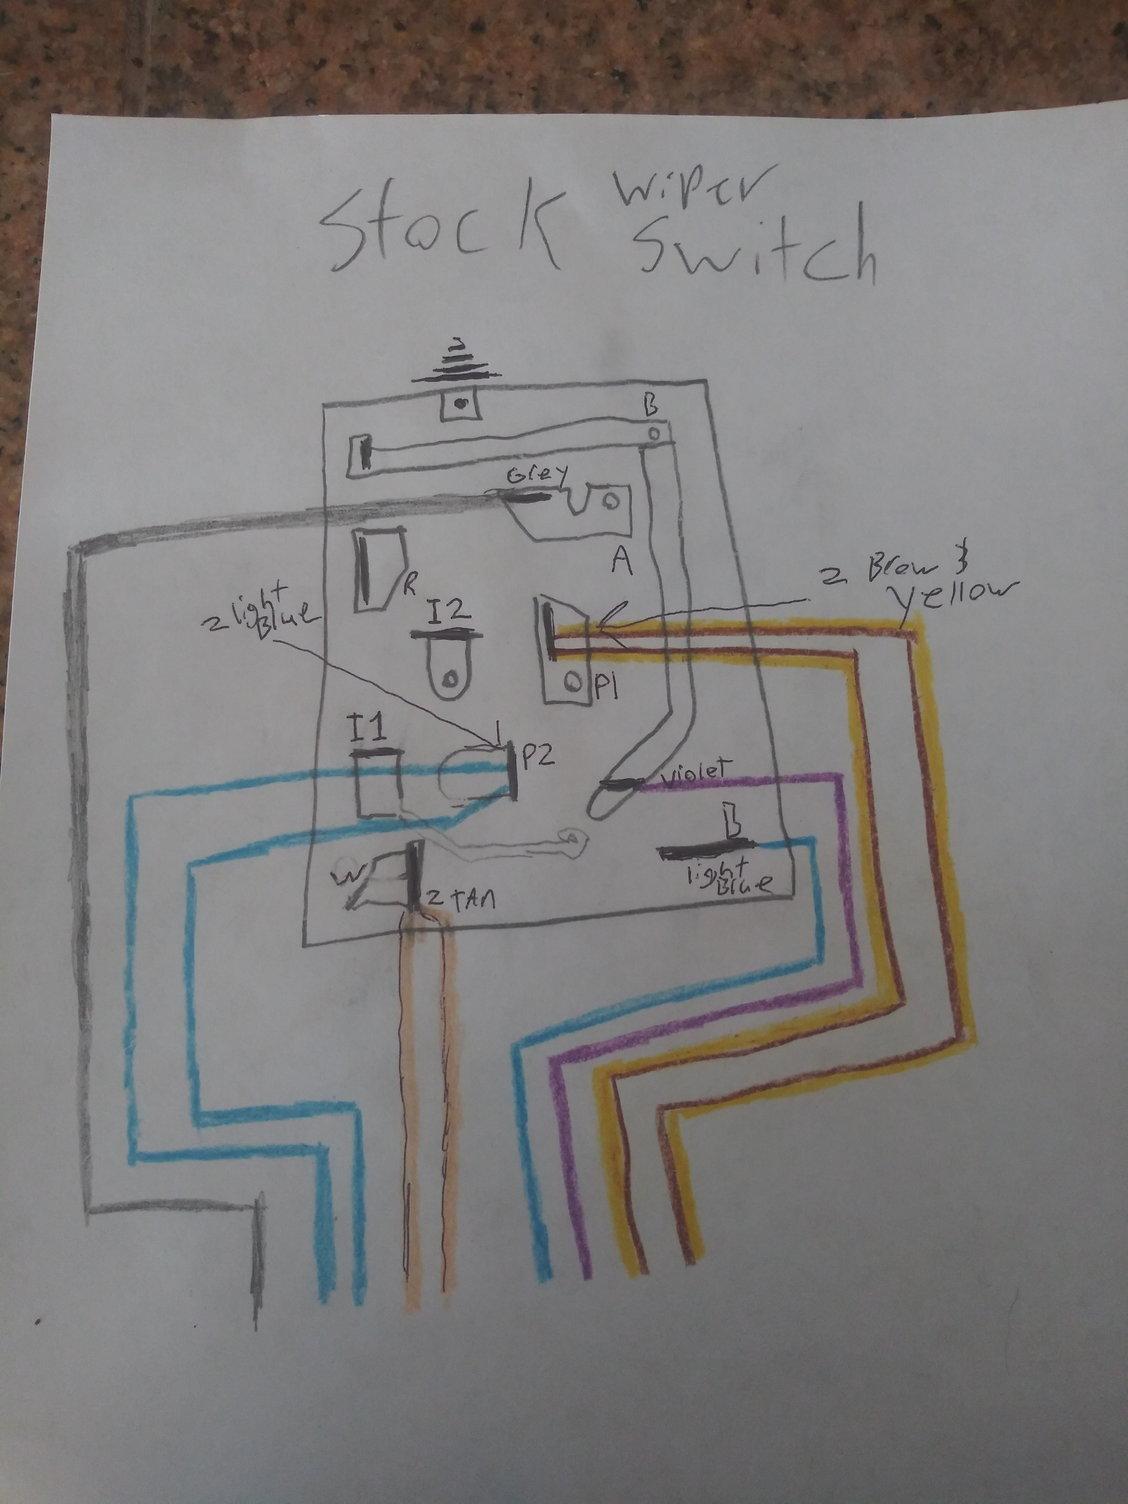 31 Universal Wiper Switch Wiring Diagram - Wiring Diagram ...